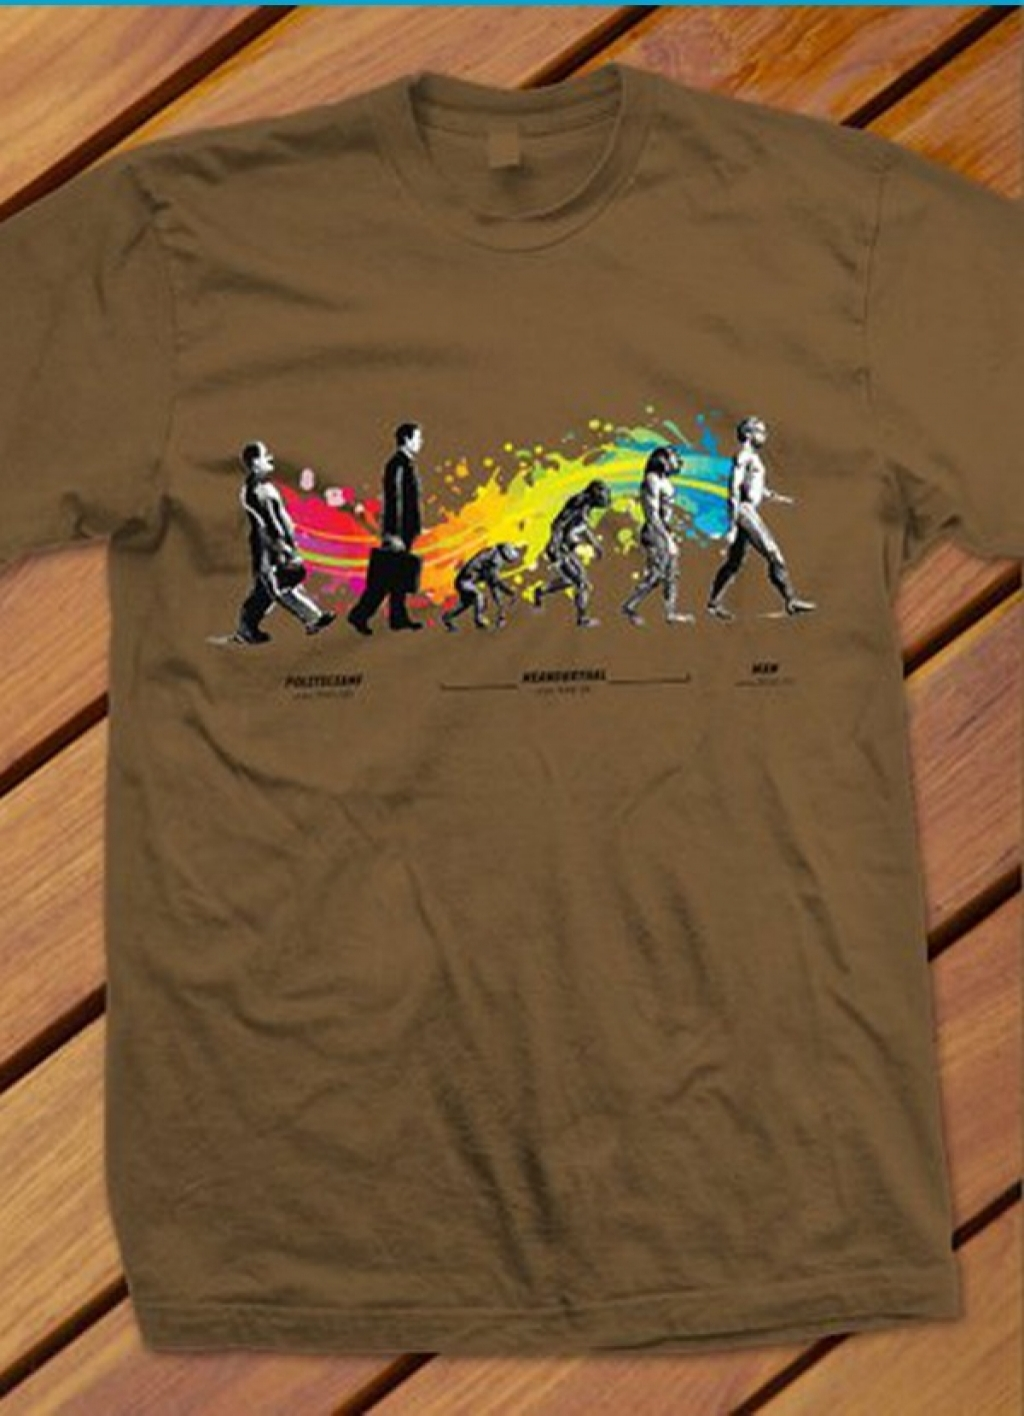 15106831210_uth-oye-shirt-artwork.jpeg